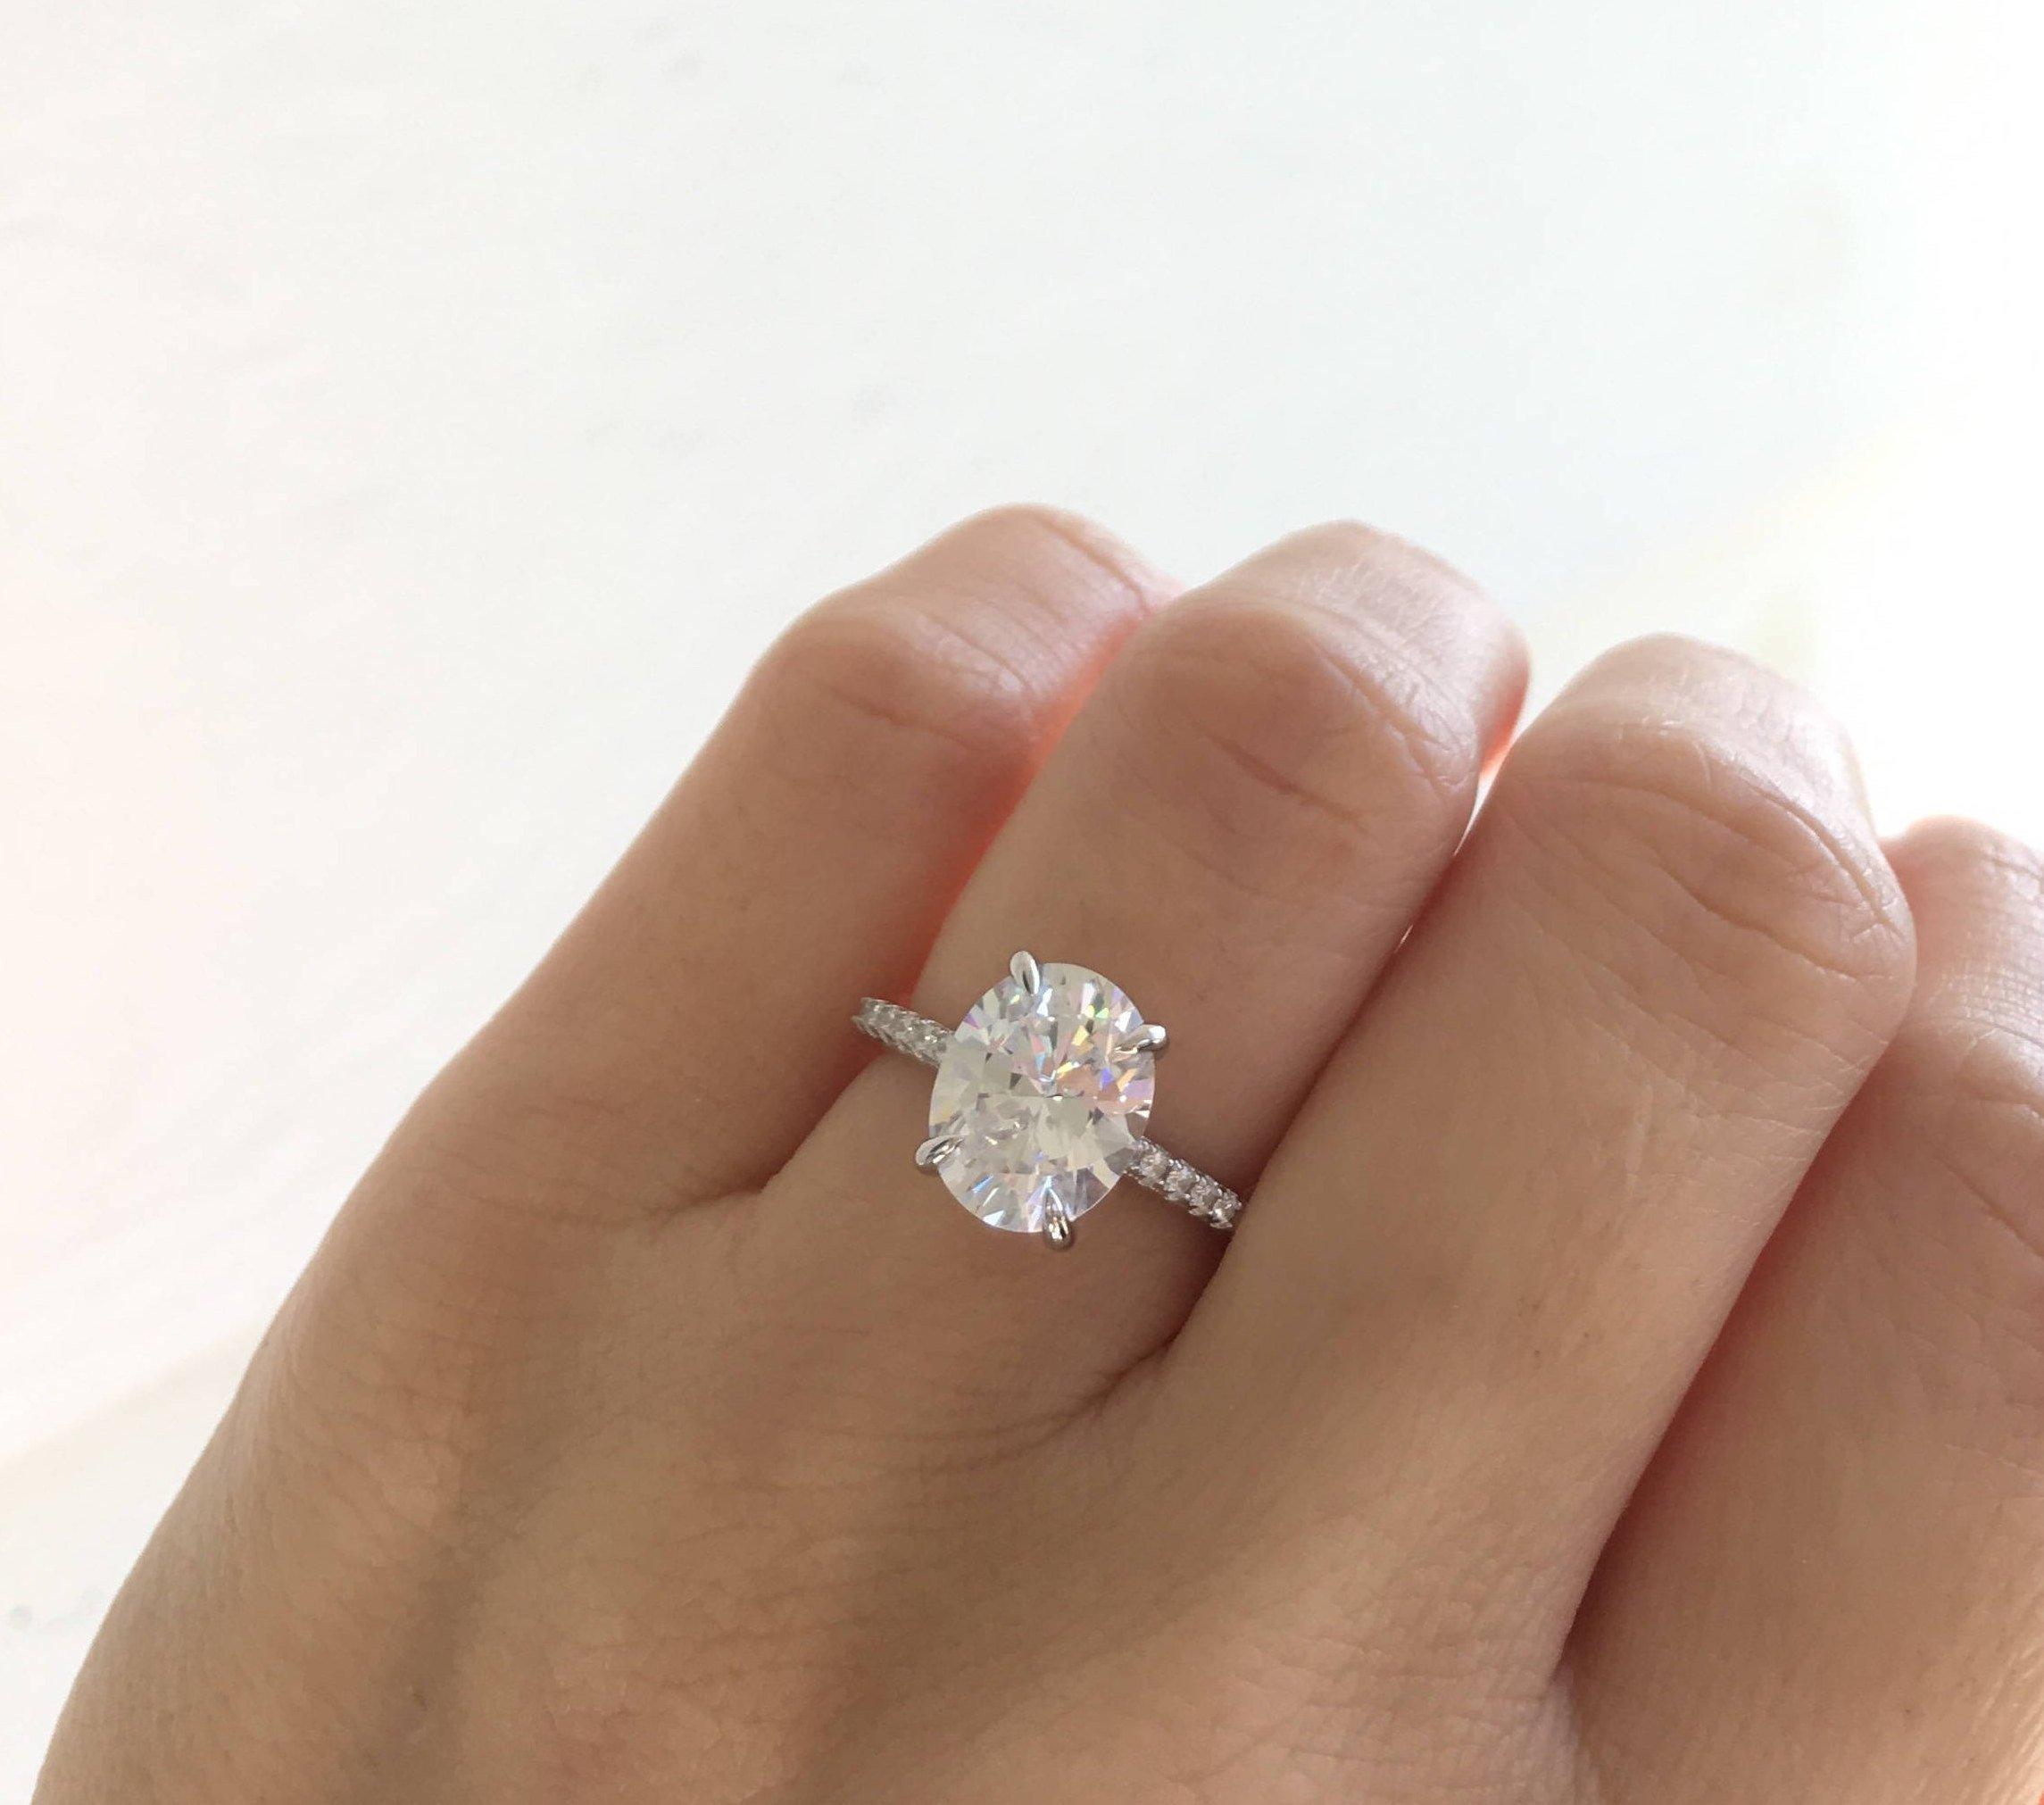 Solitaire Gold Diamond Engagement Ring.jpg